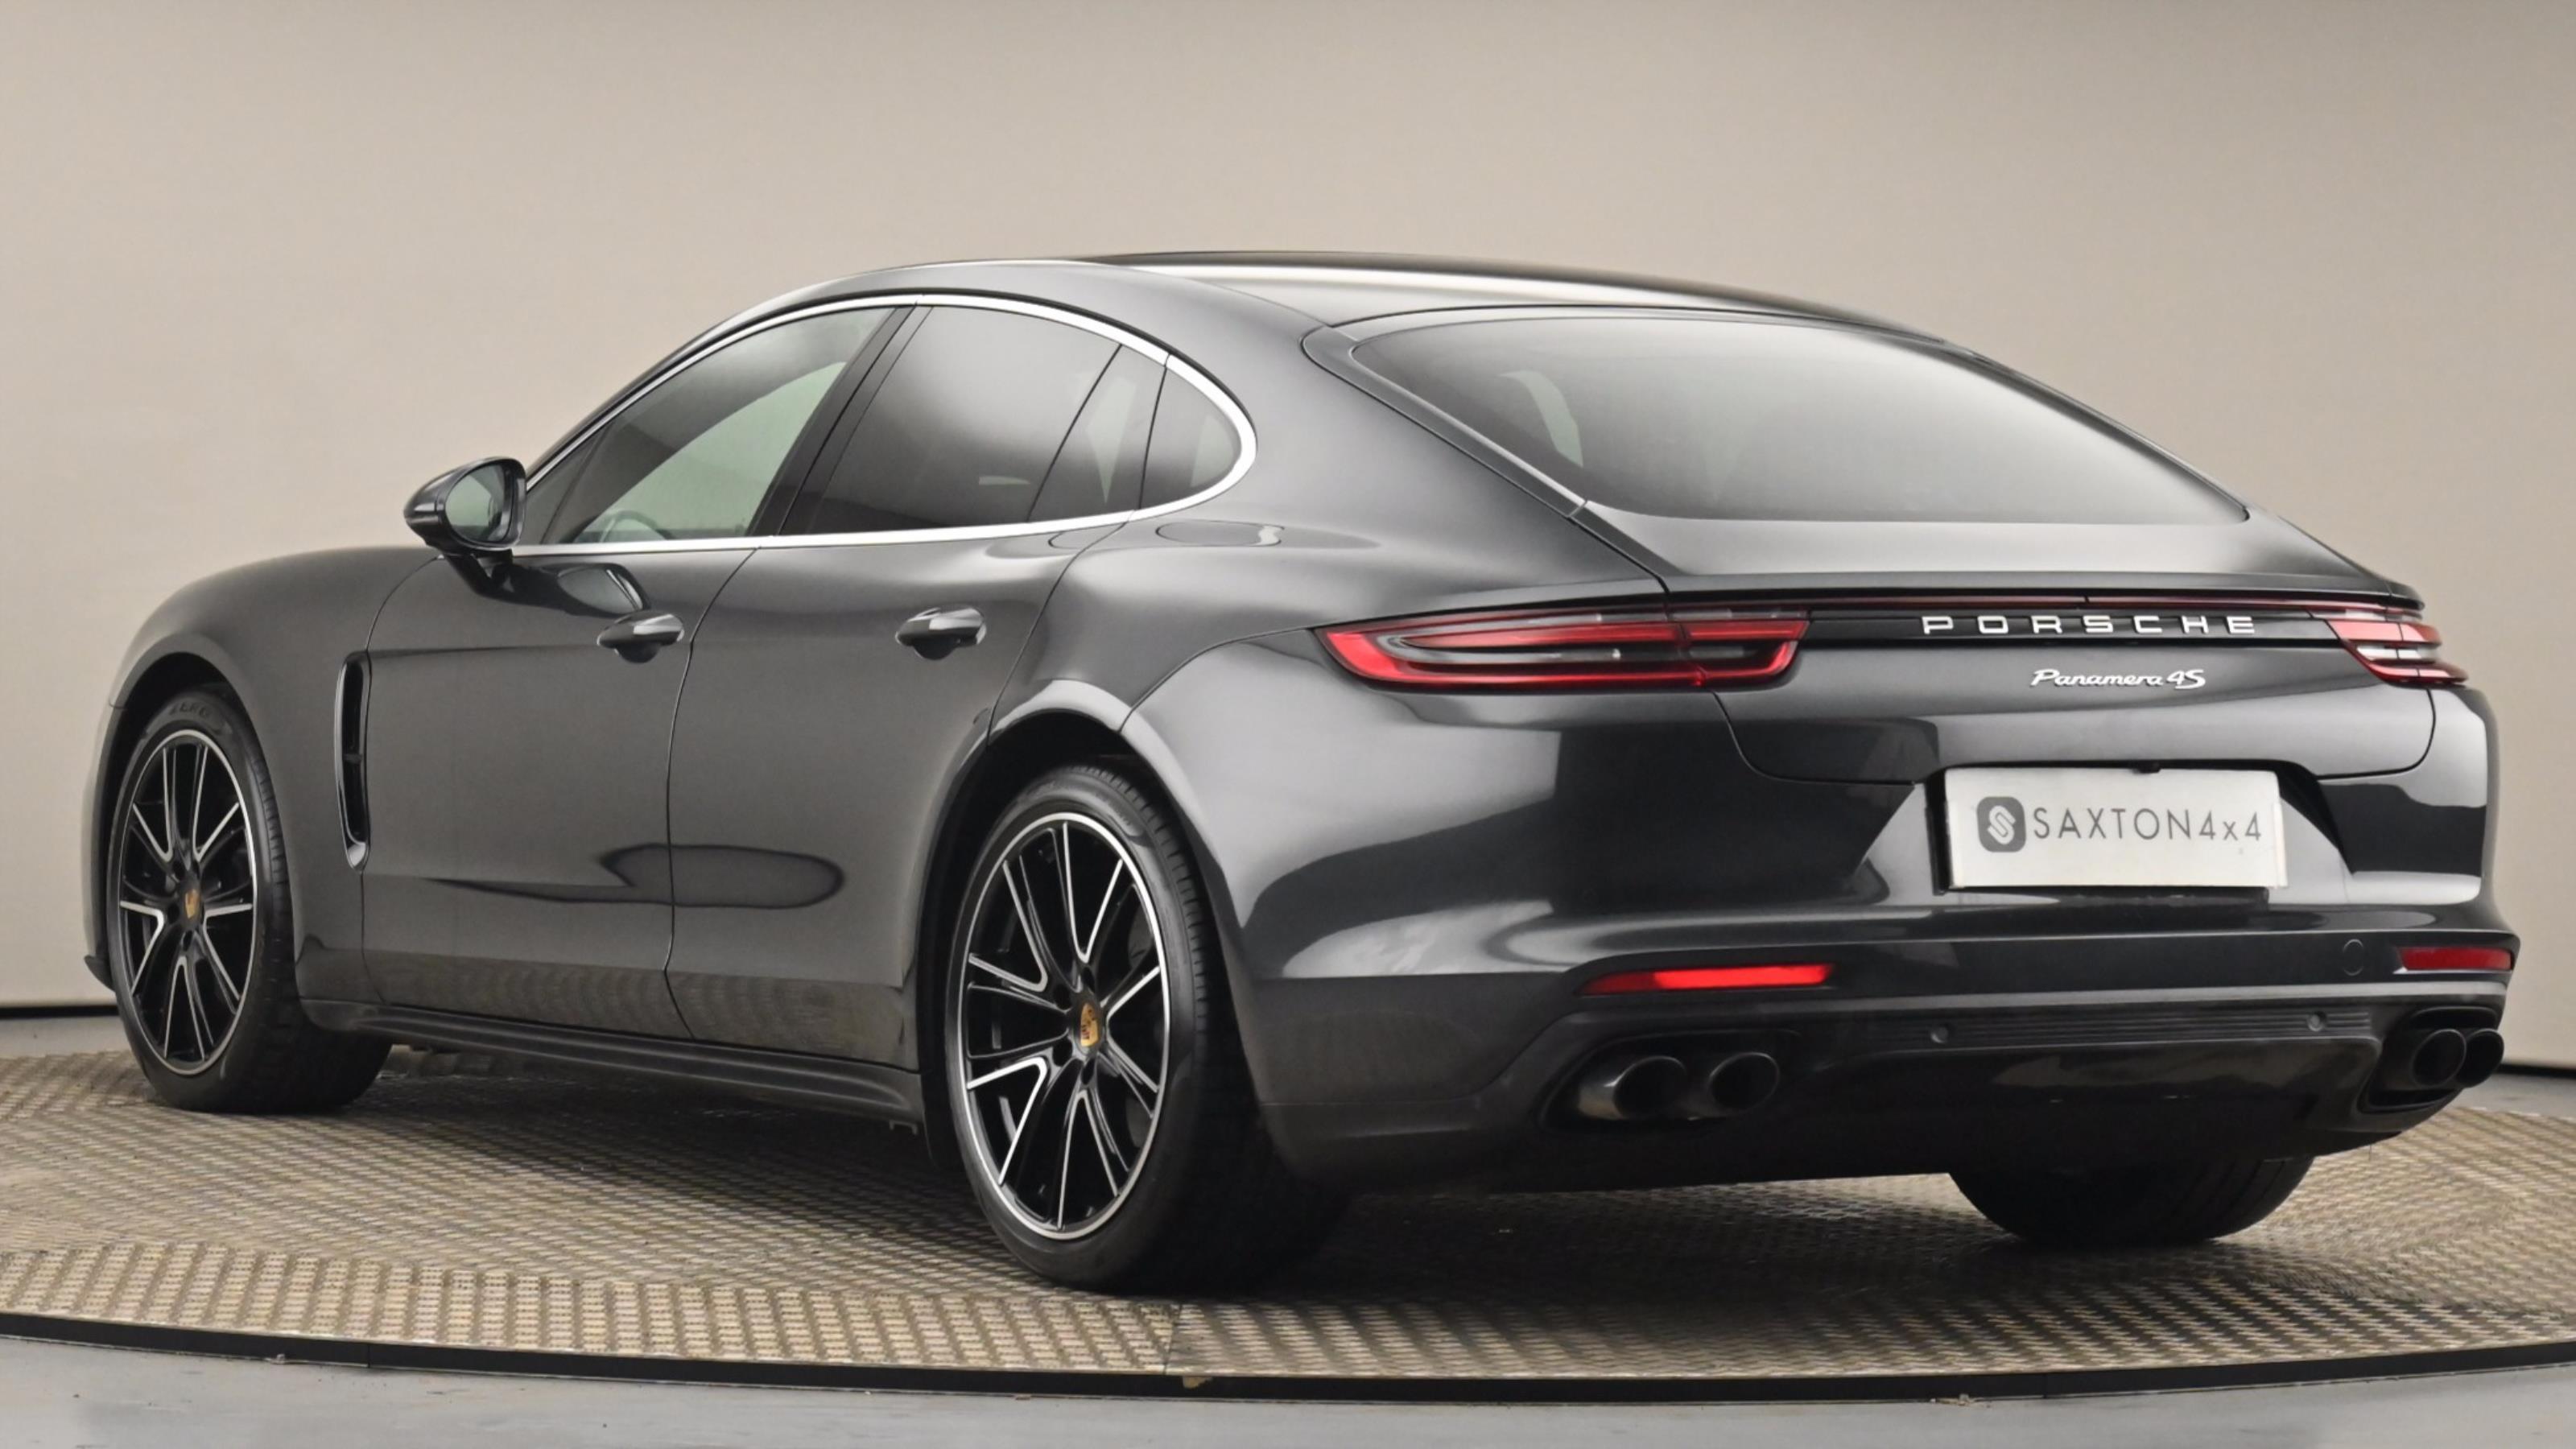 Used 2019 Porsche PANAMERA 2.9 V6 4S 5dr PDK           at Saxton4x4